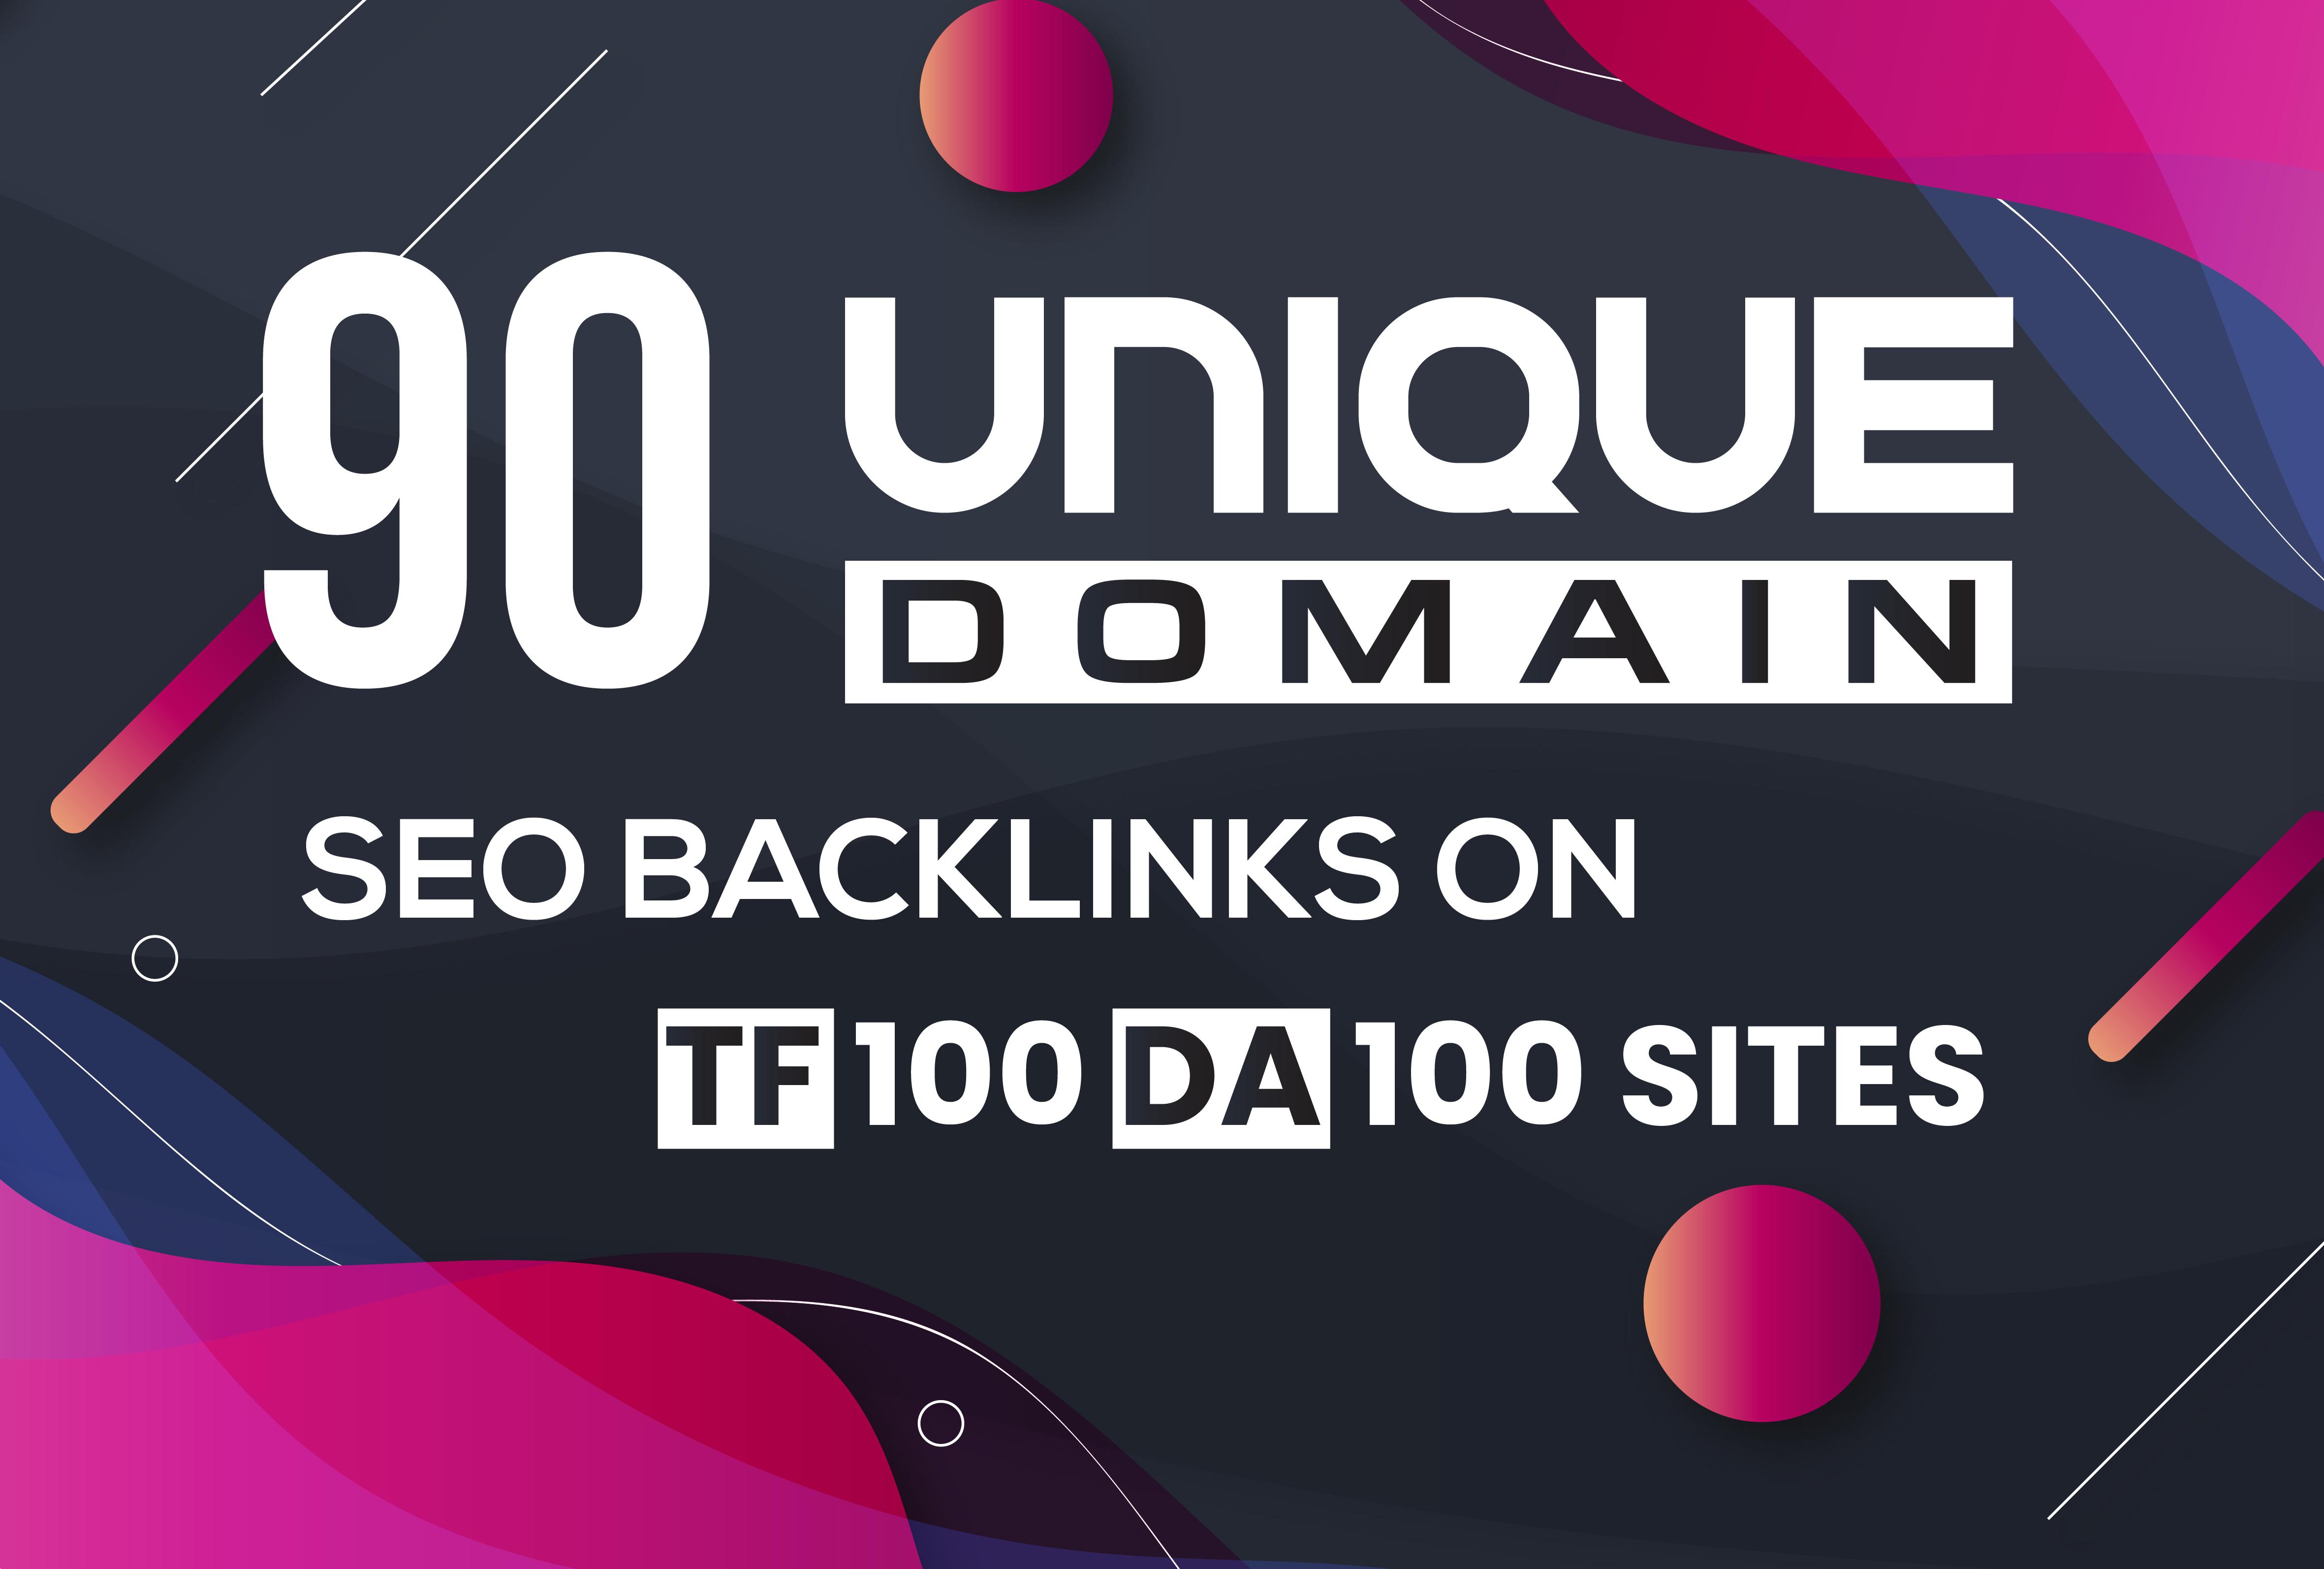 I Will Manually Build 90 UNIQUE DOMAIN SEO Backlinks On DA 100 TF 100 Sites